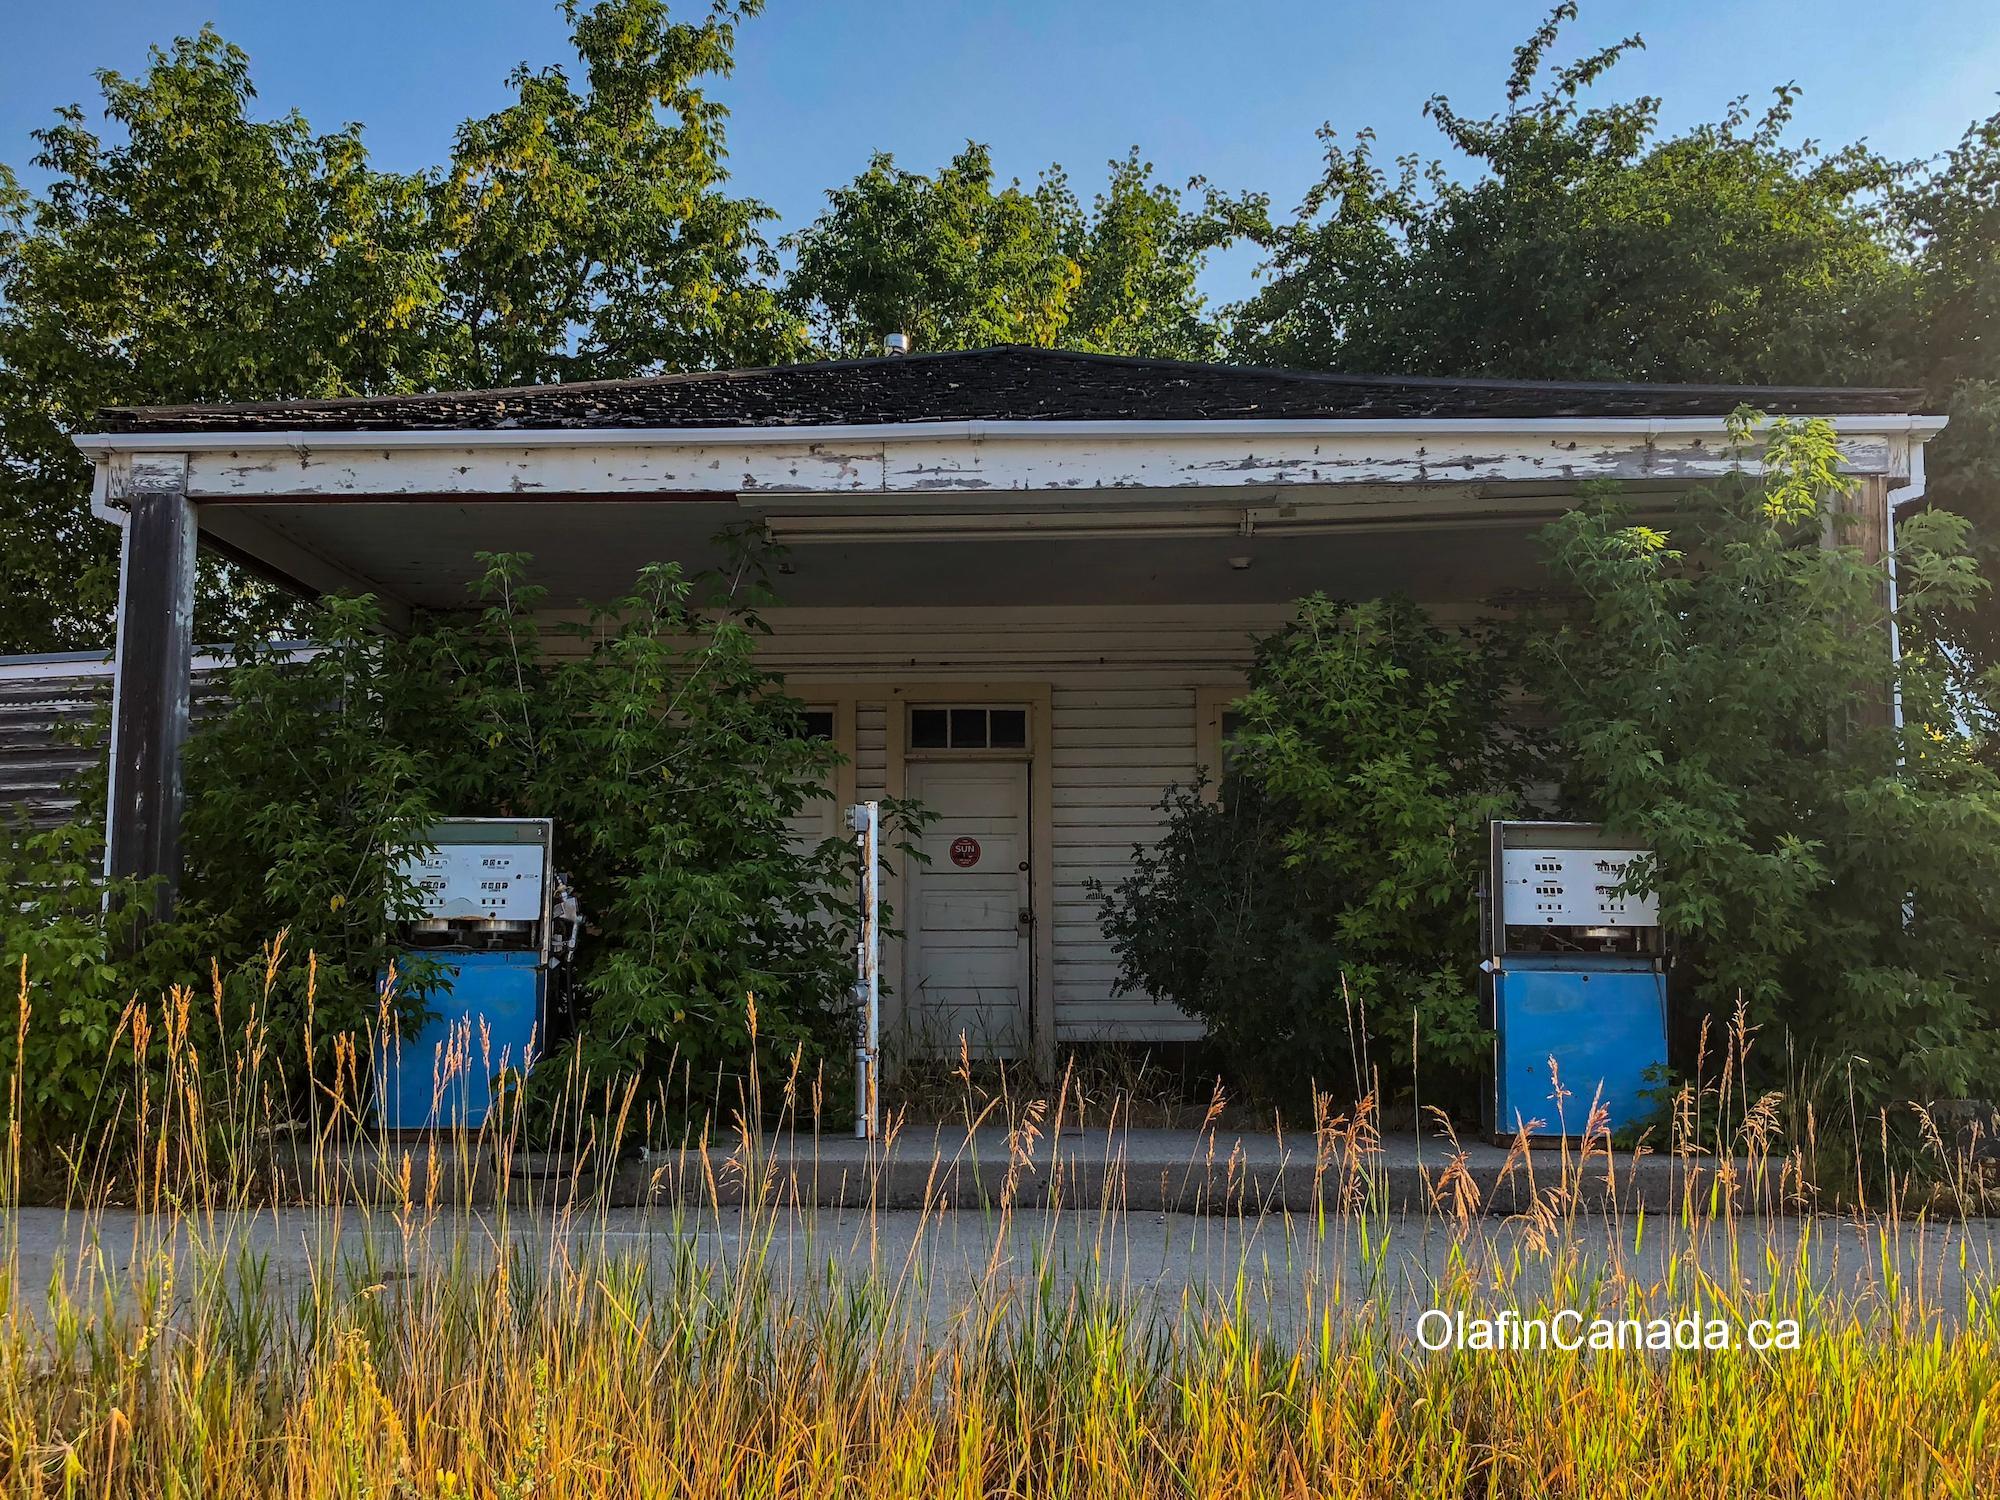 Mocassin Flats Gas and Confectionary in Bellevue, Alberta #olafincanada #alberta #abandoned #gasstation